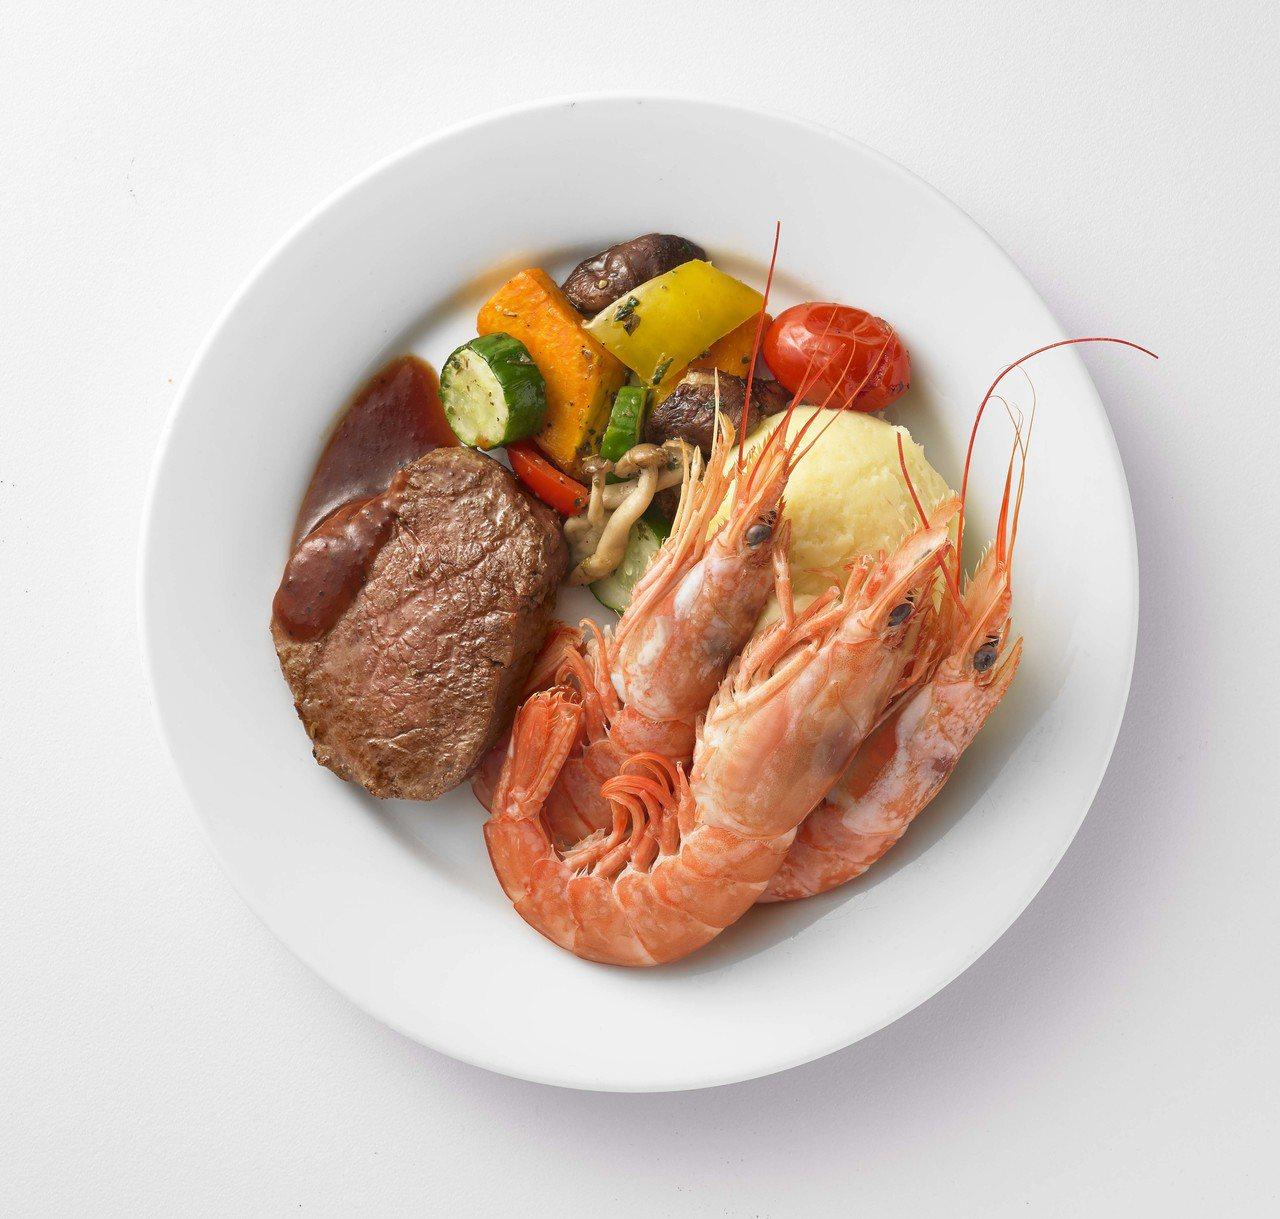 IKEA海陸大餐是菲力牛排與天使紅蝦的絕佳組合,搭配溫烤蔬菜、薯泥再淋上畫龍點睛...